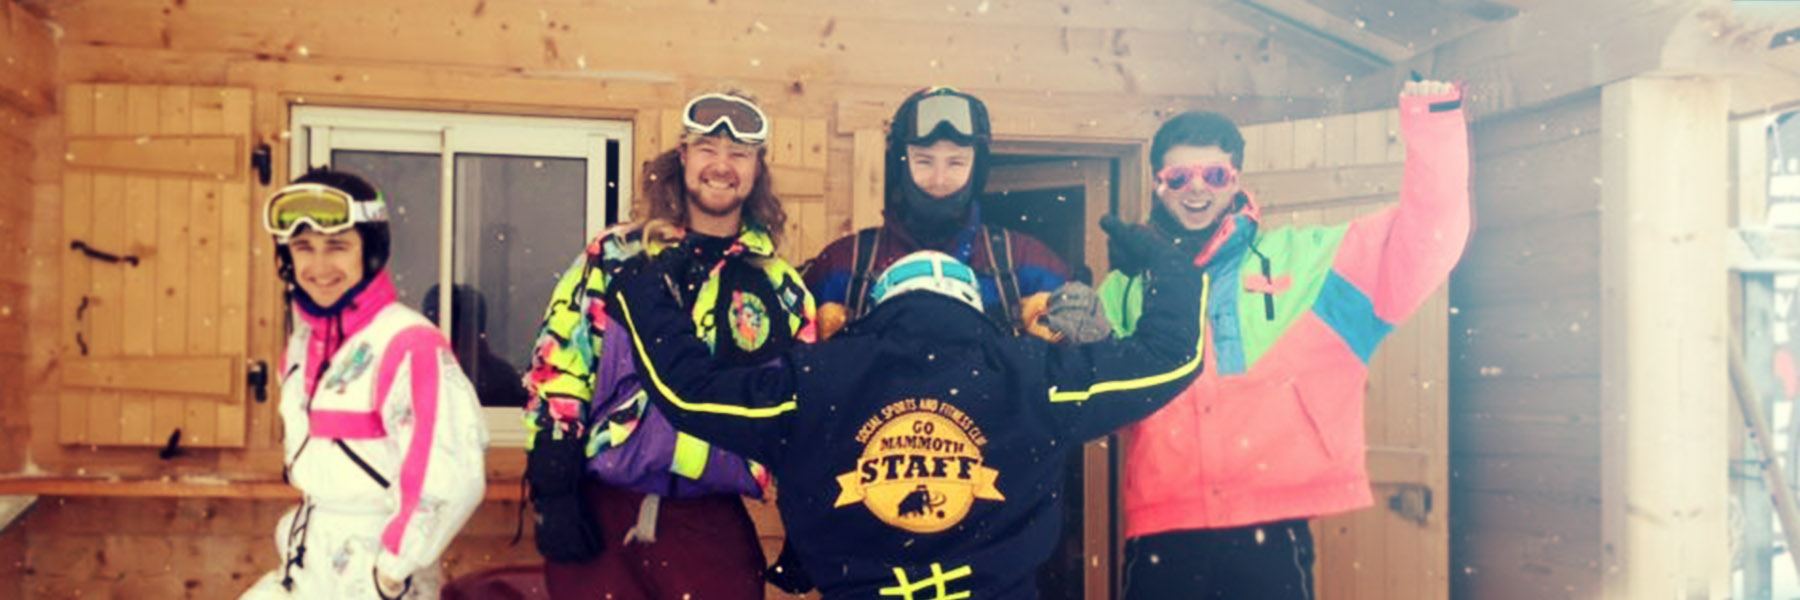 skihomepages_0005_Turquoise Haze